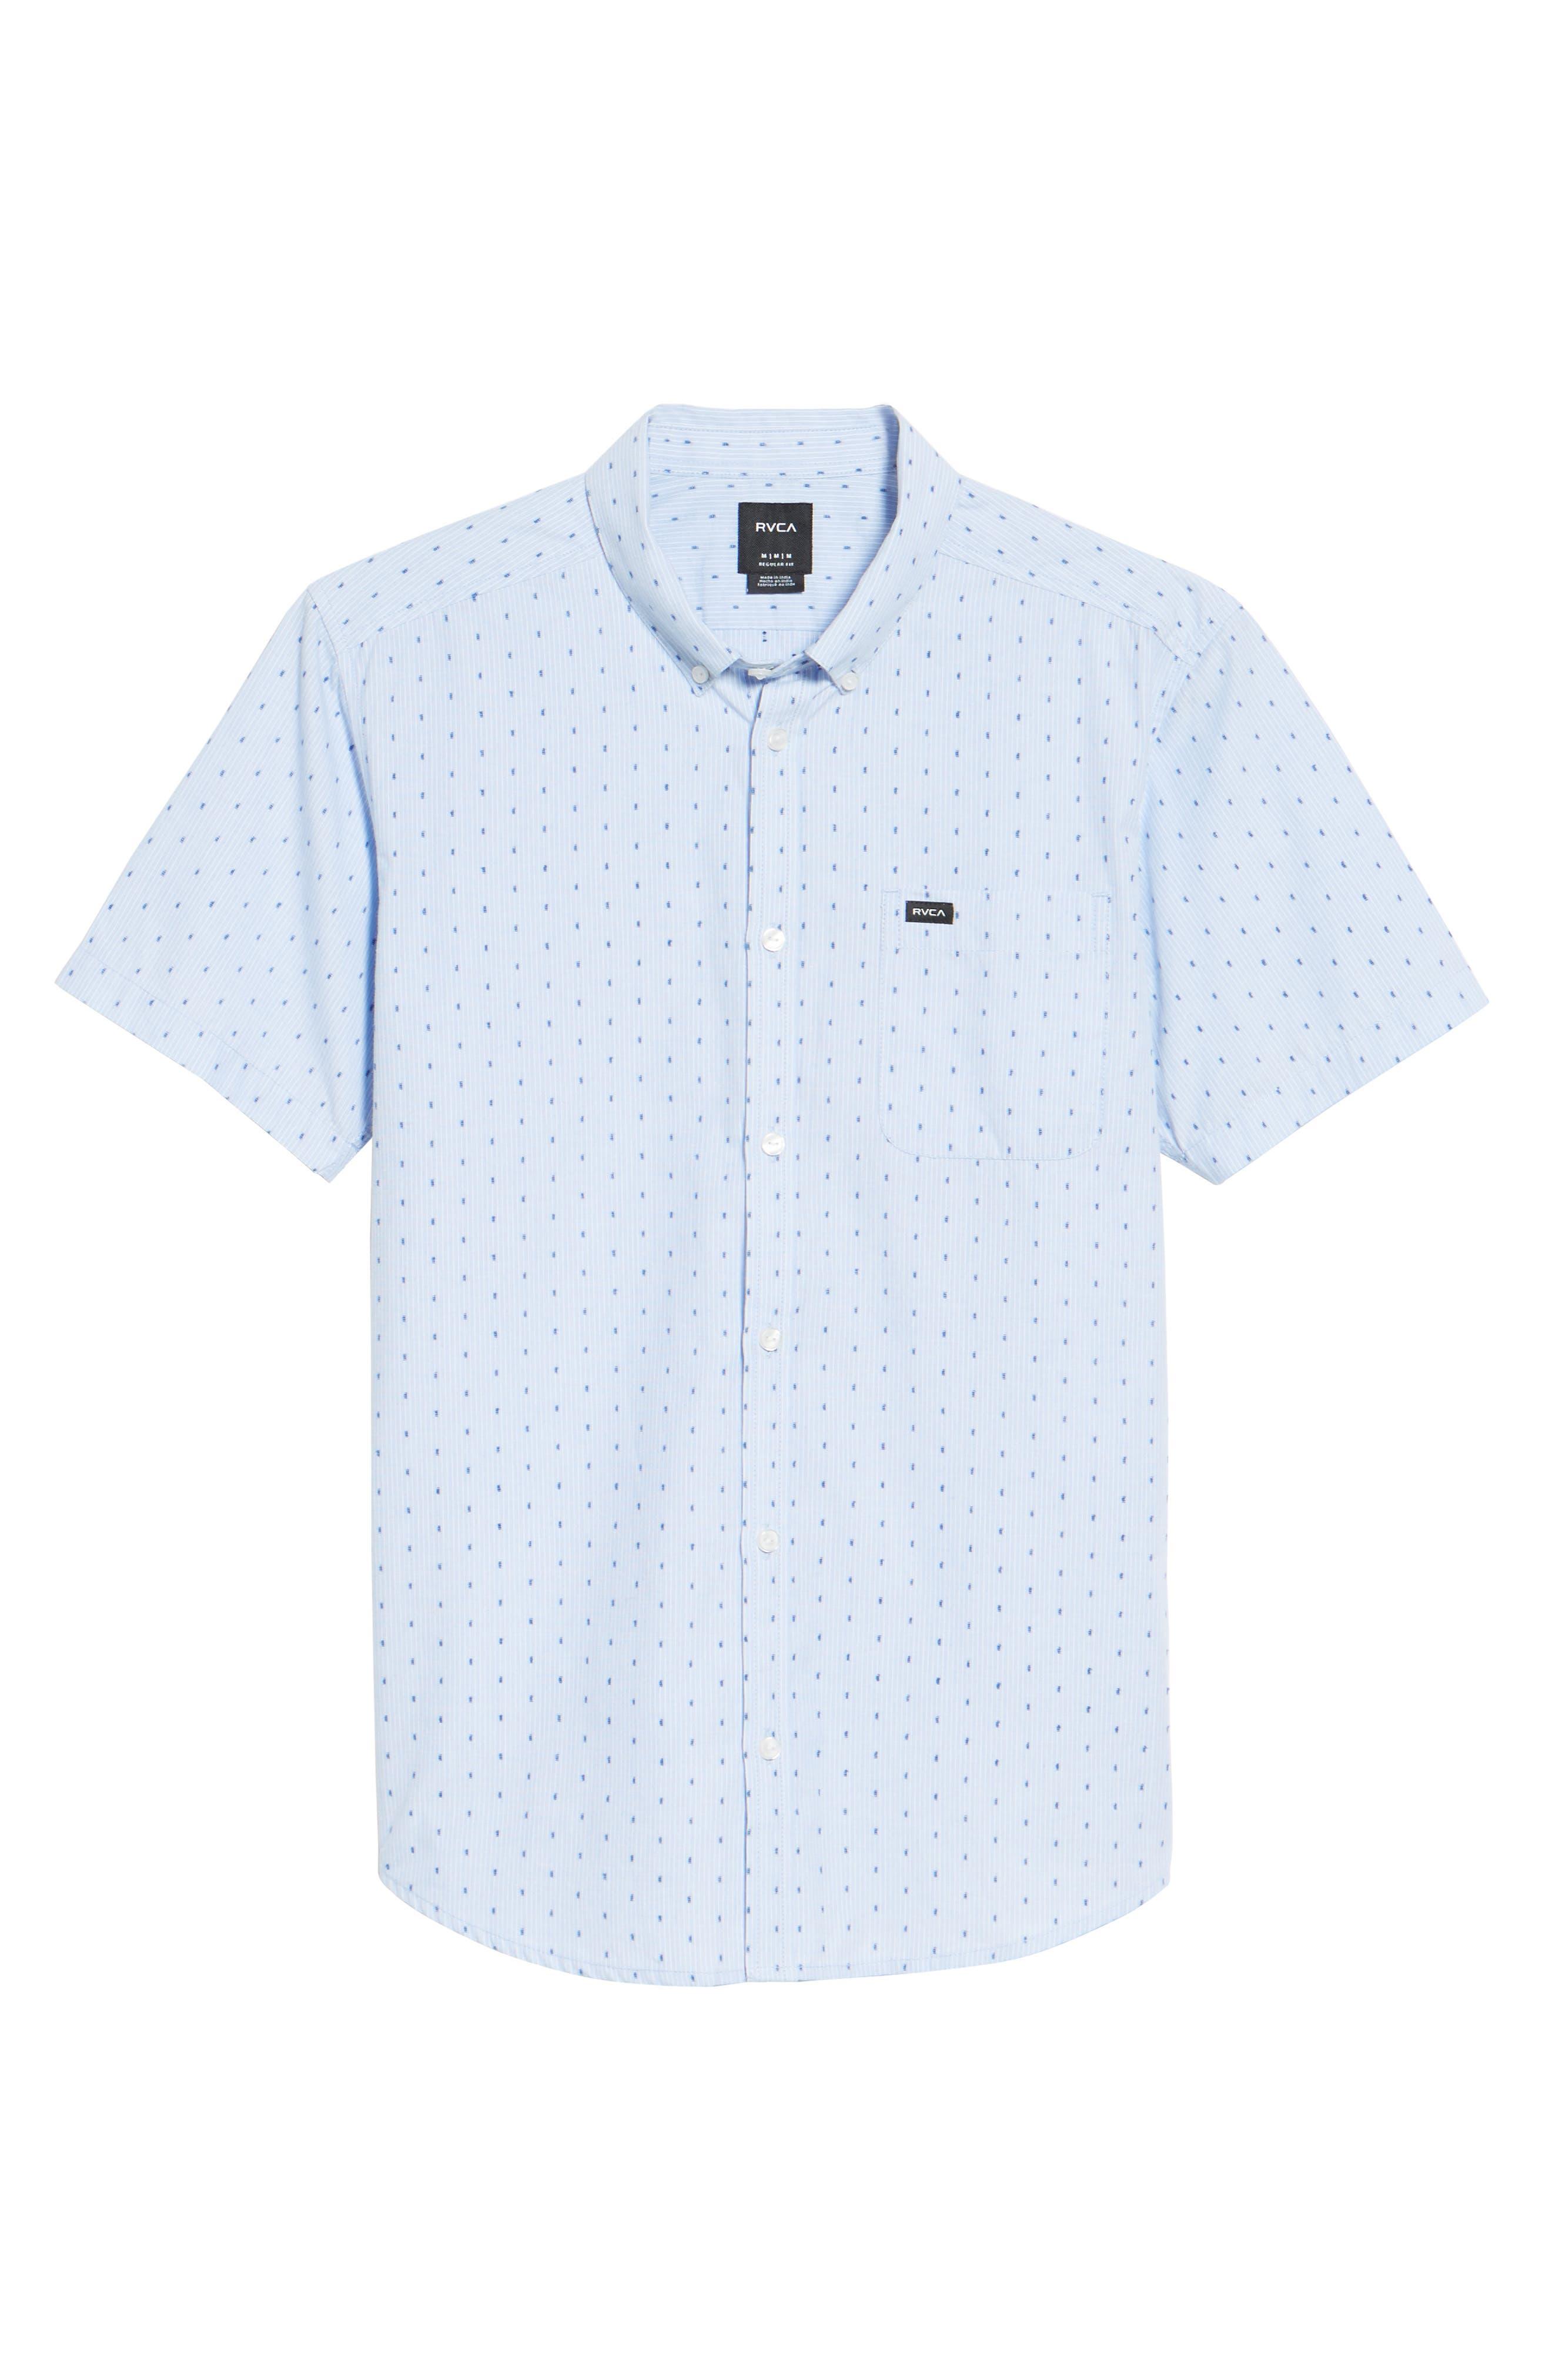 Alternate Image 1 Selected - RVCA Return Dobby Woven Shirt